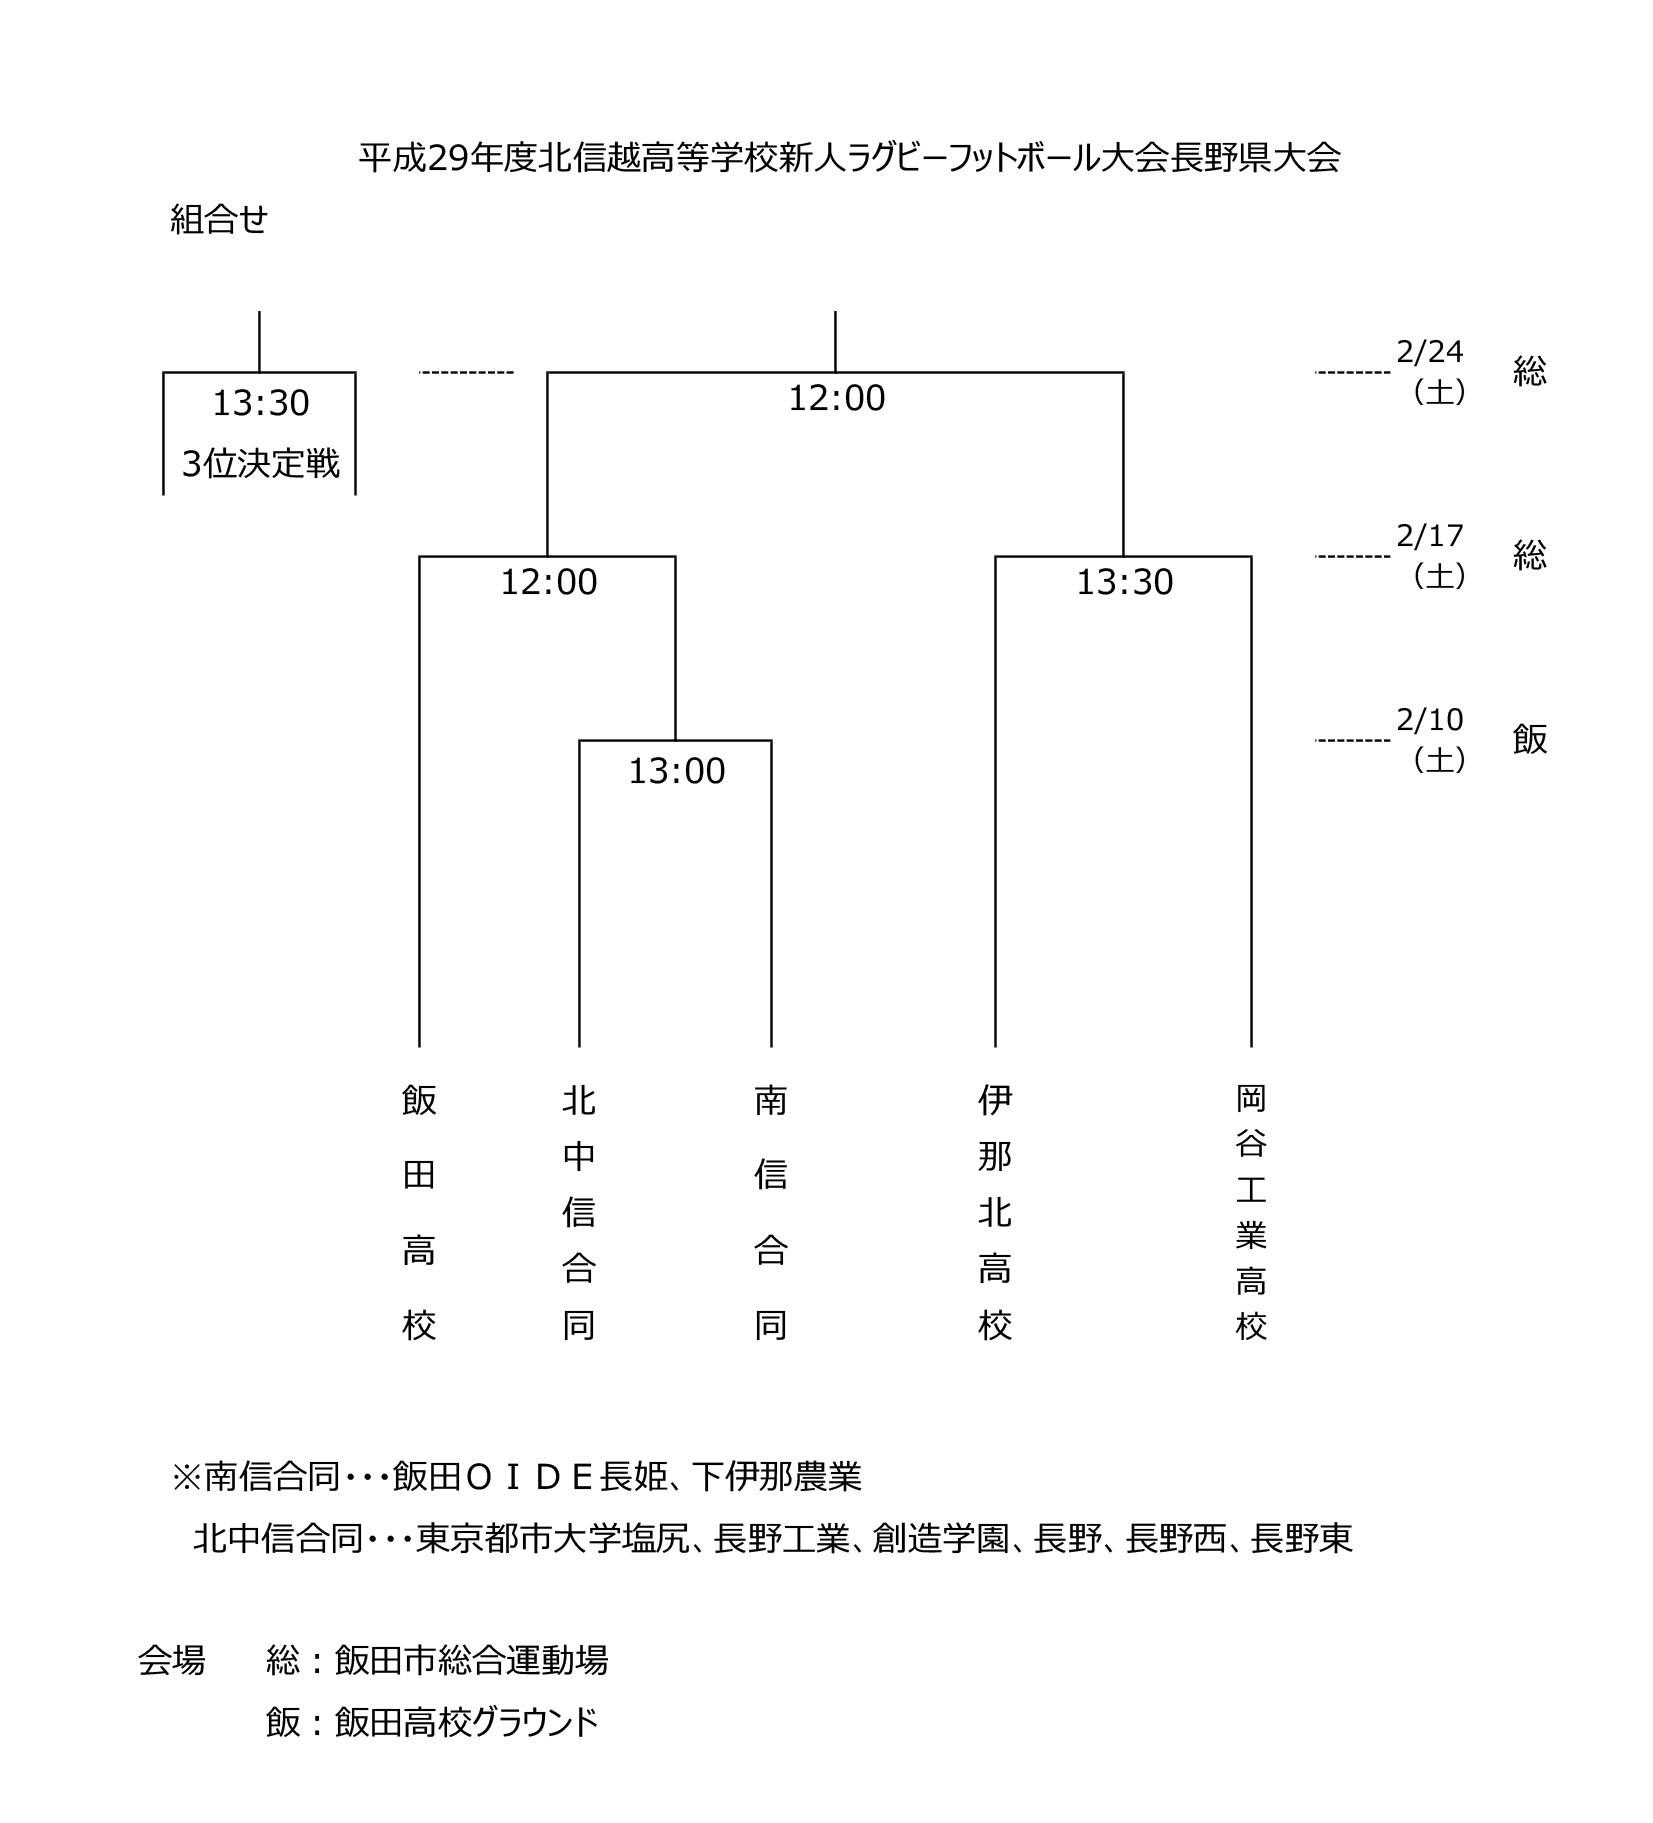 H29-Shinjin_tournament.jpg